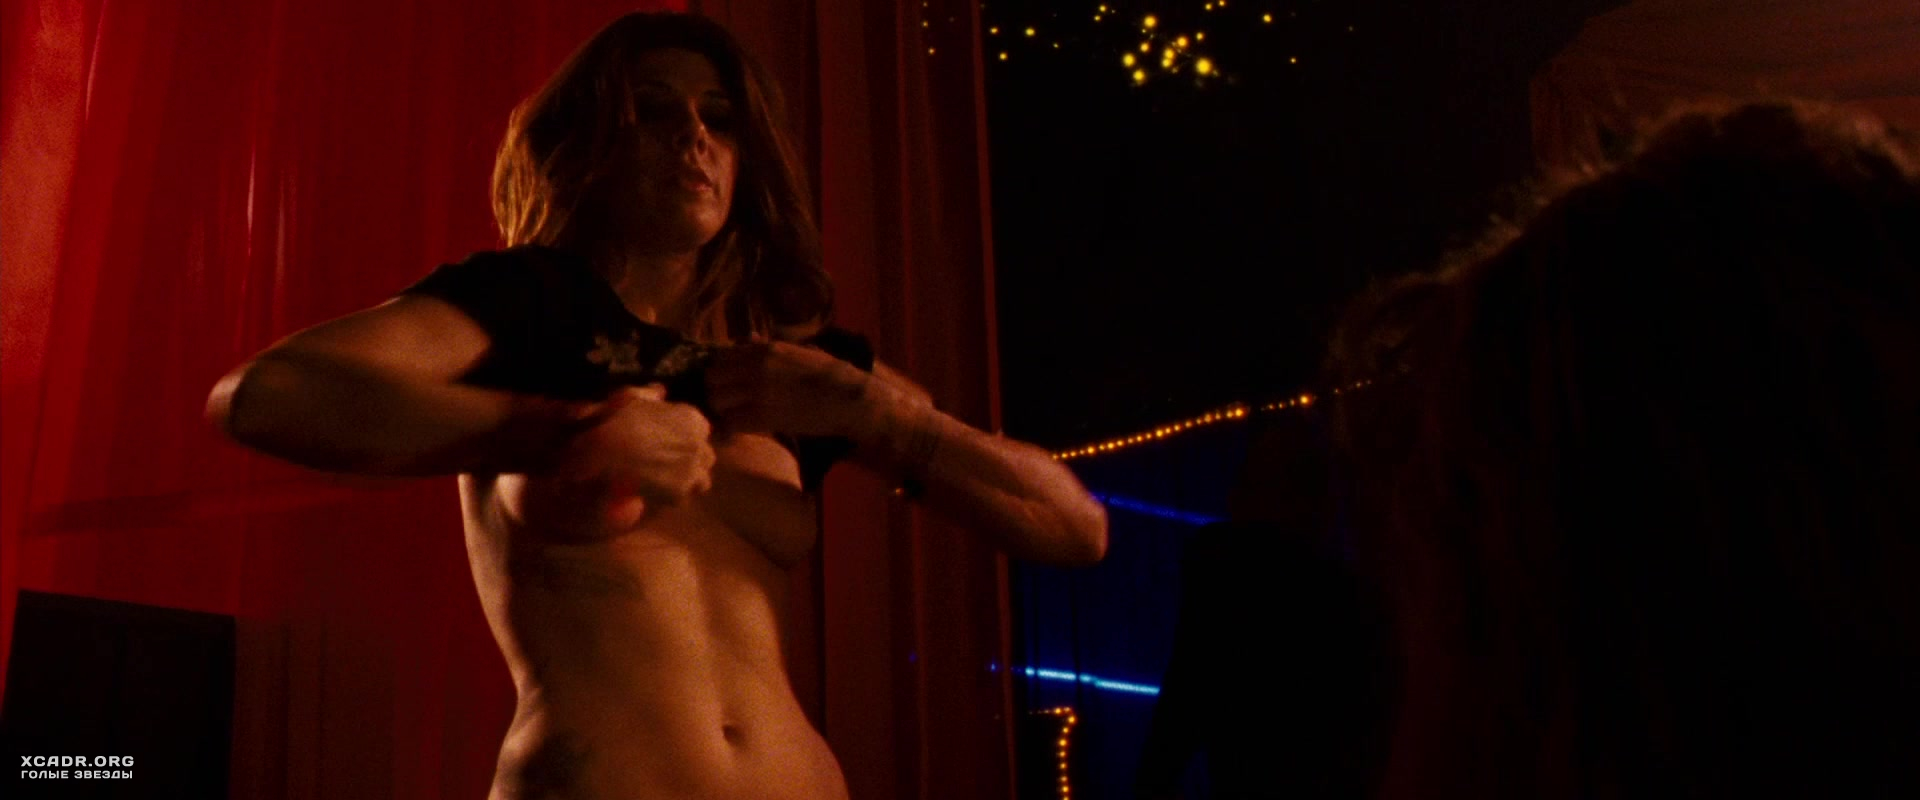 In the wrestler marisa tomei nude